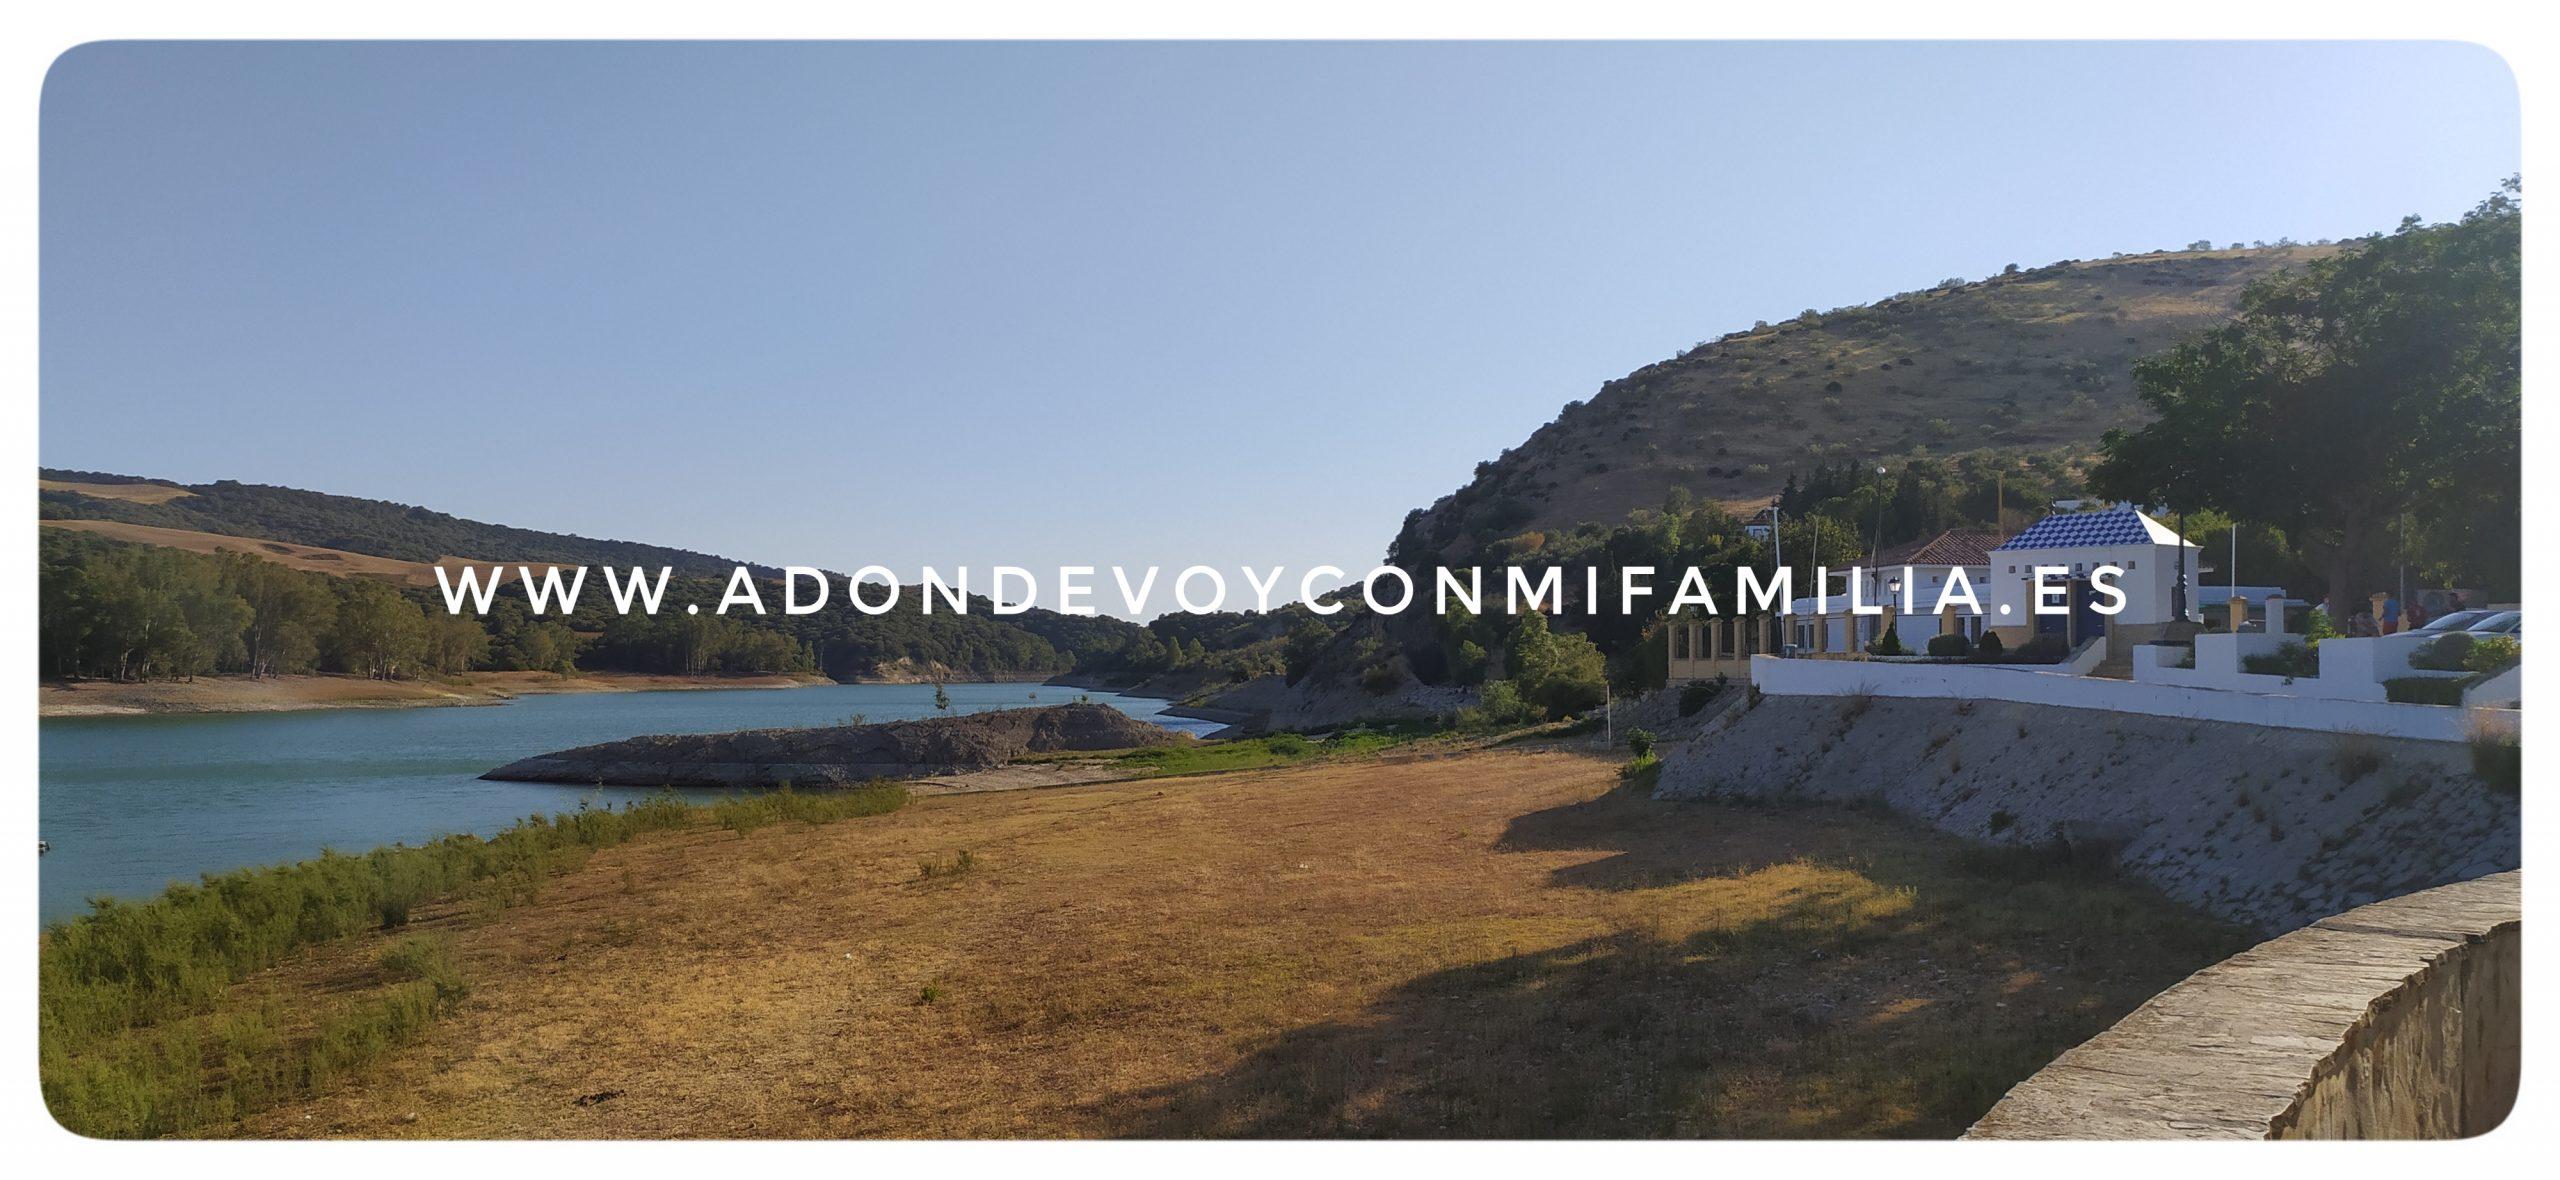 bornos adondevoyconmifamilia (15)